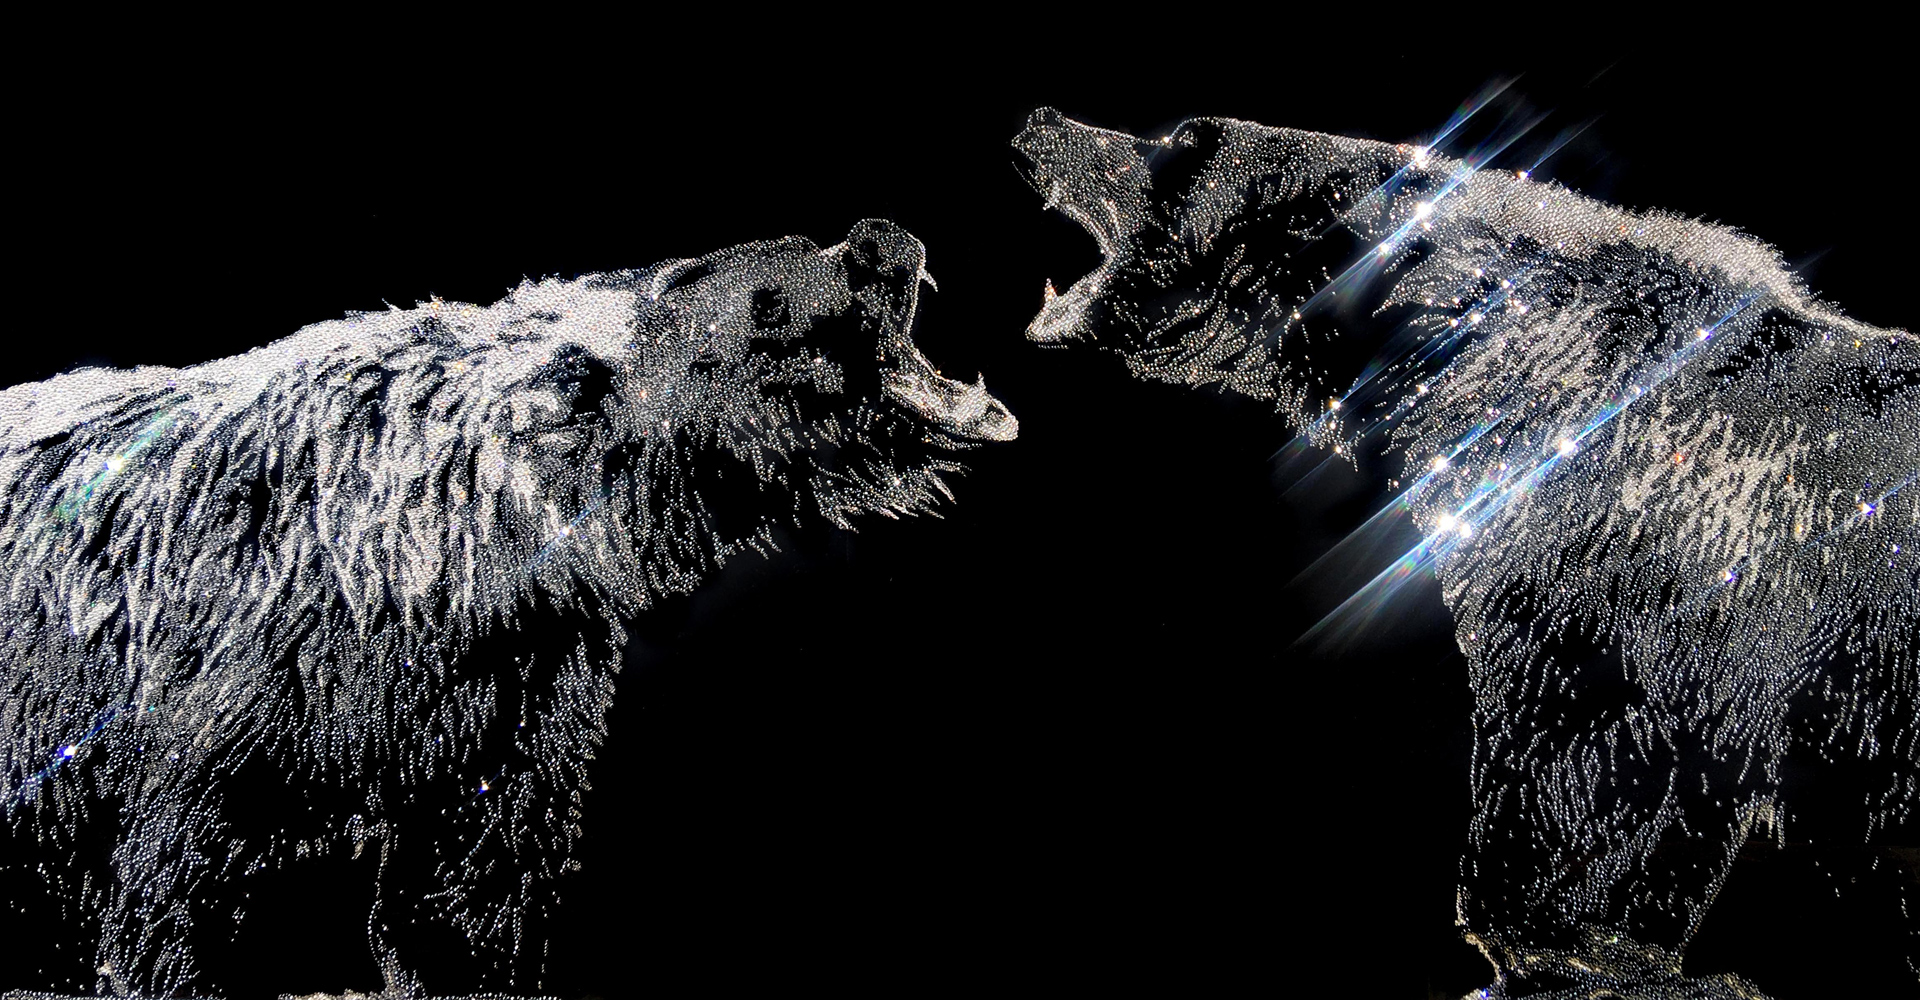 Can you feel my anger?, 40800 Crystals from Swarovski®, plexiglas, 90x150